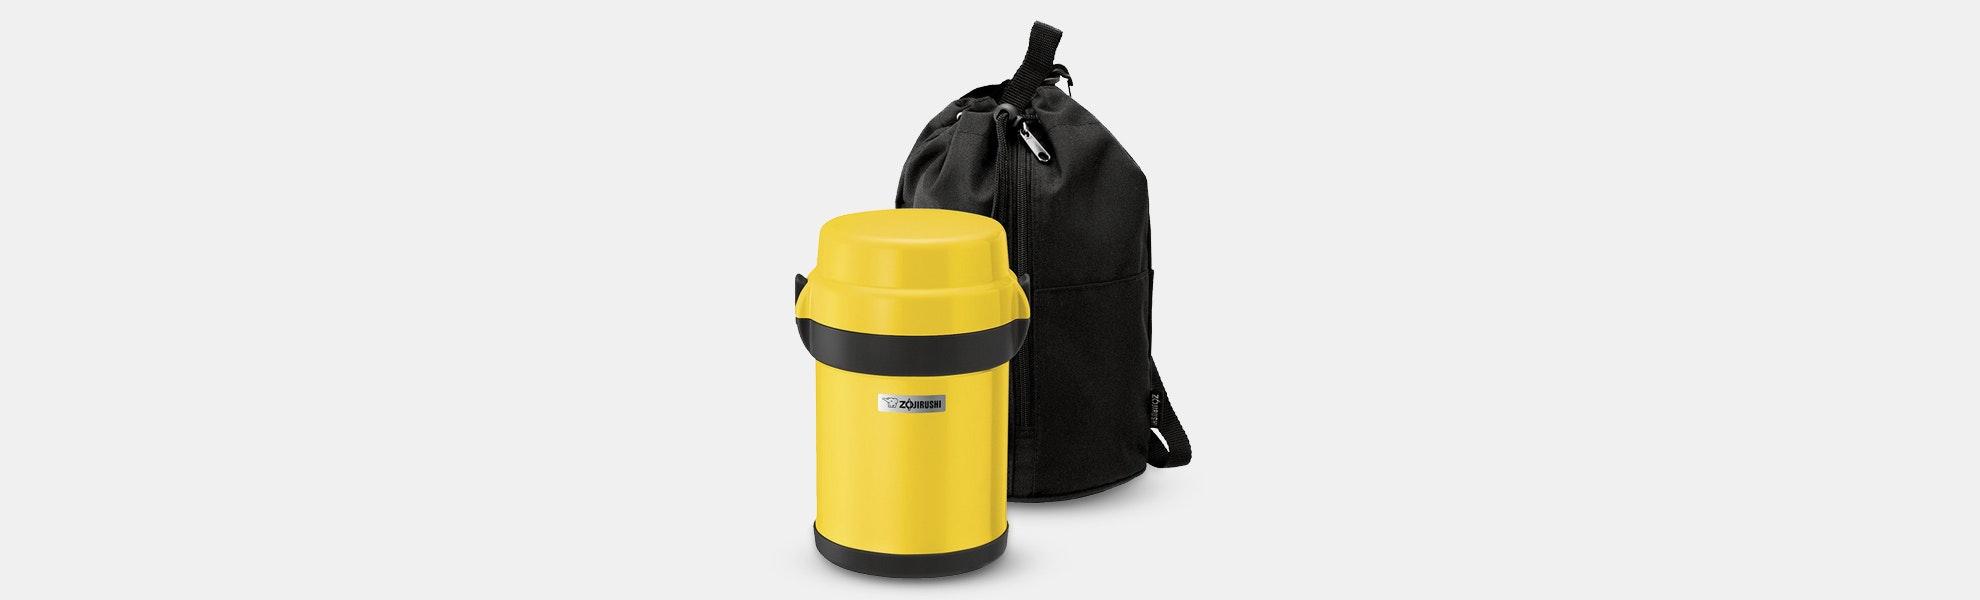 Zojirushi Mr. Bento Stainless Lunch Jar